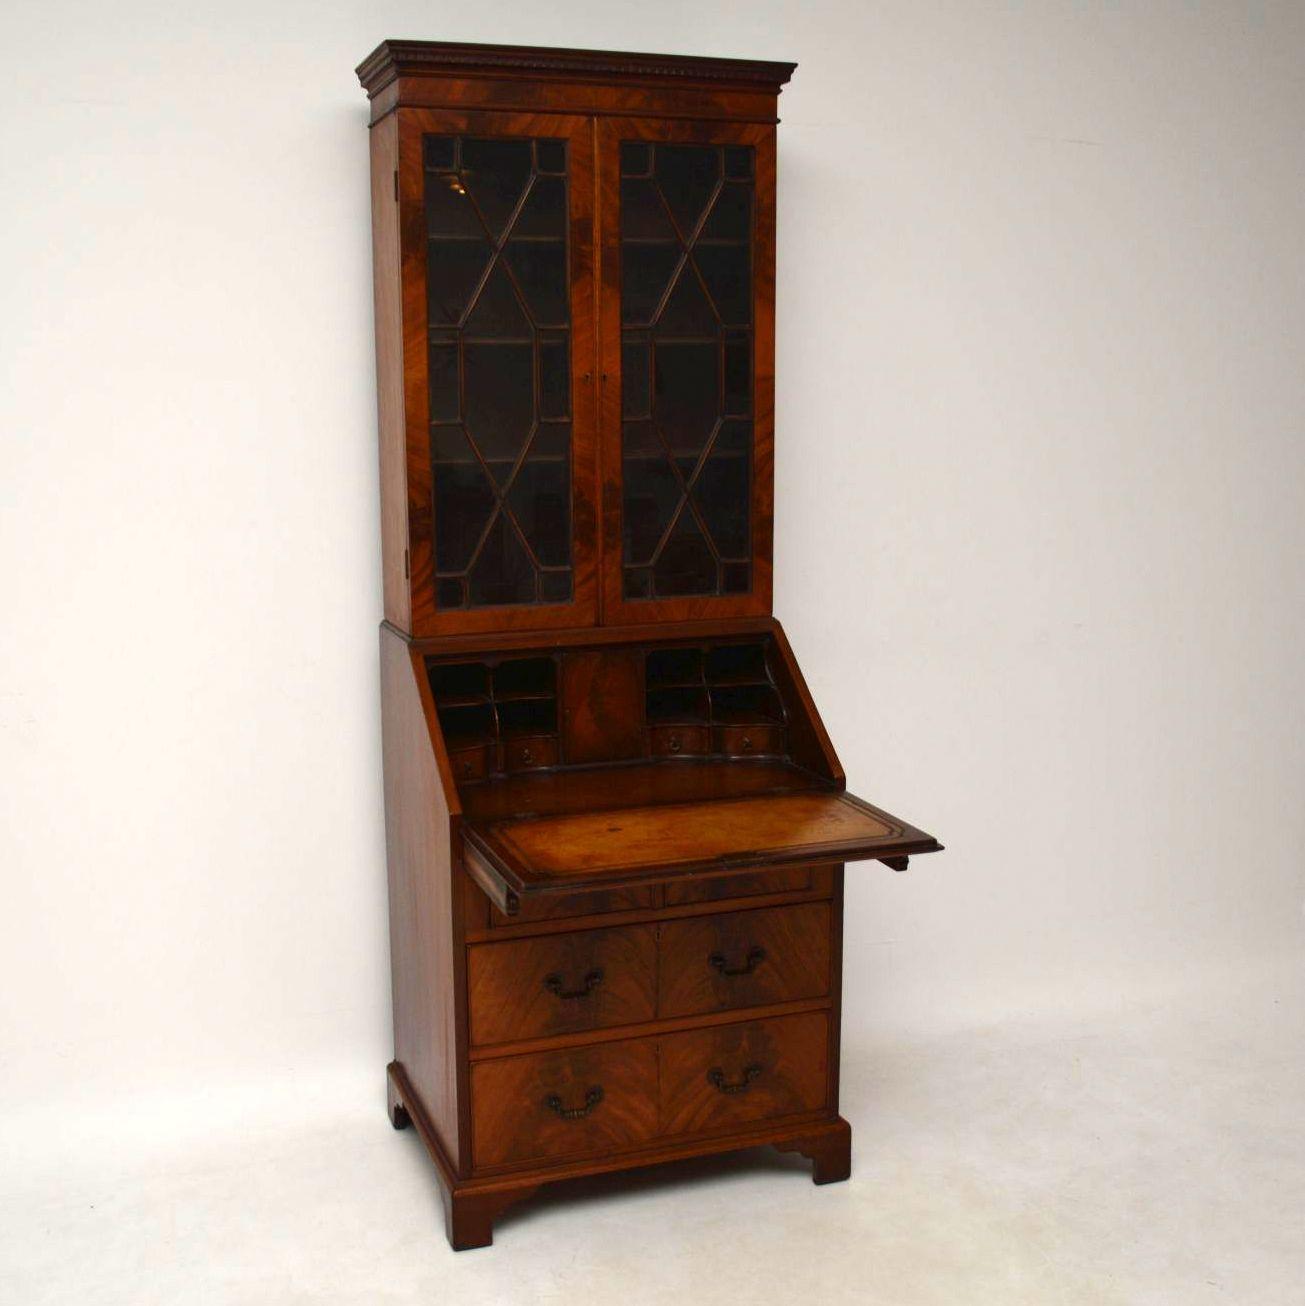 Antique Mahogany Bureau Bookcase